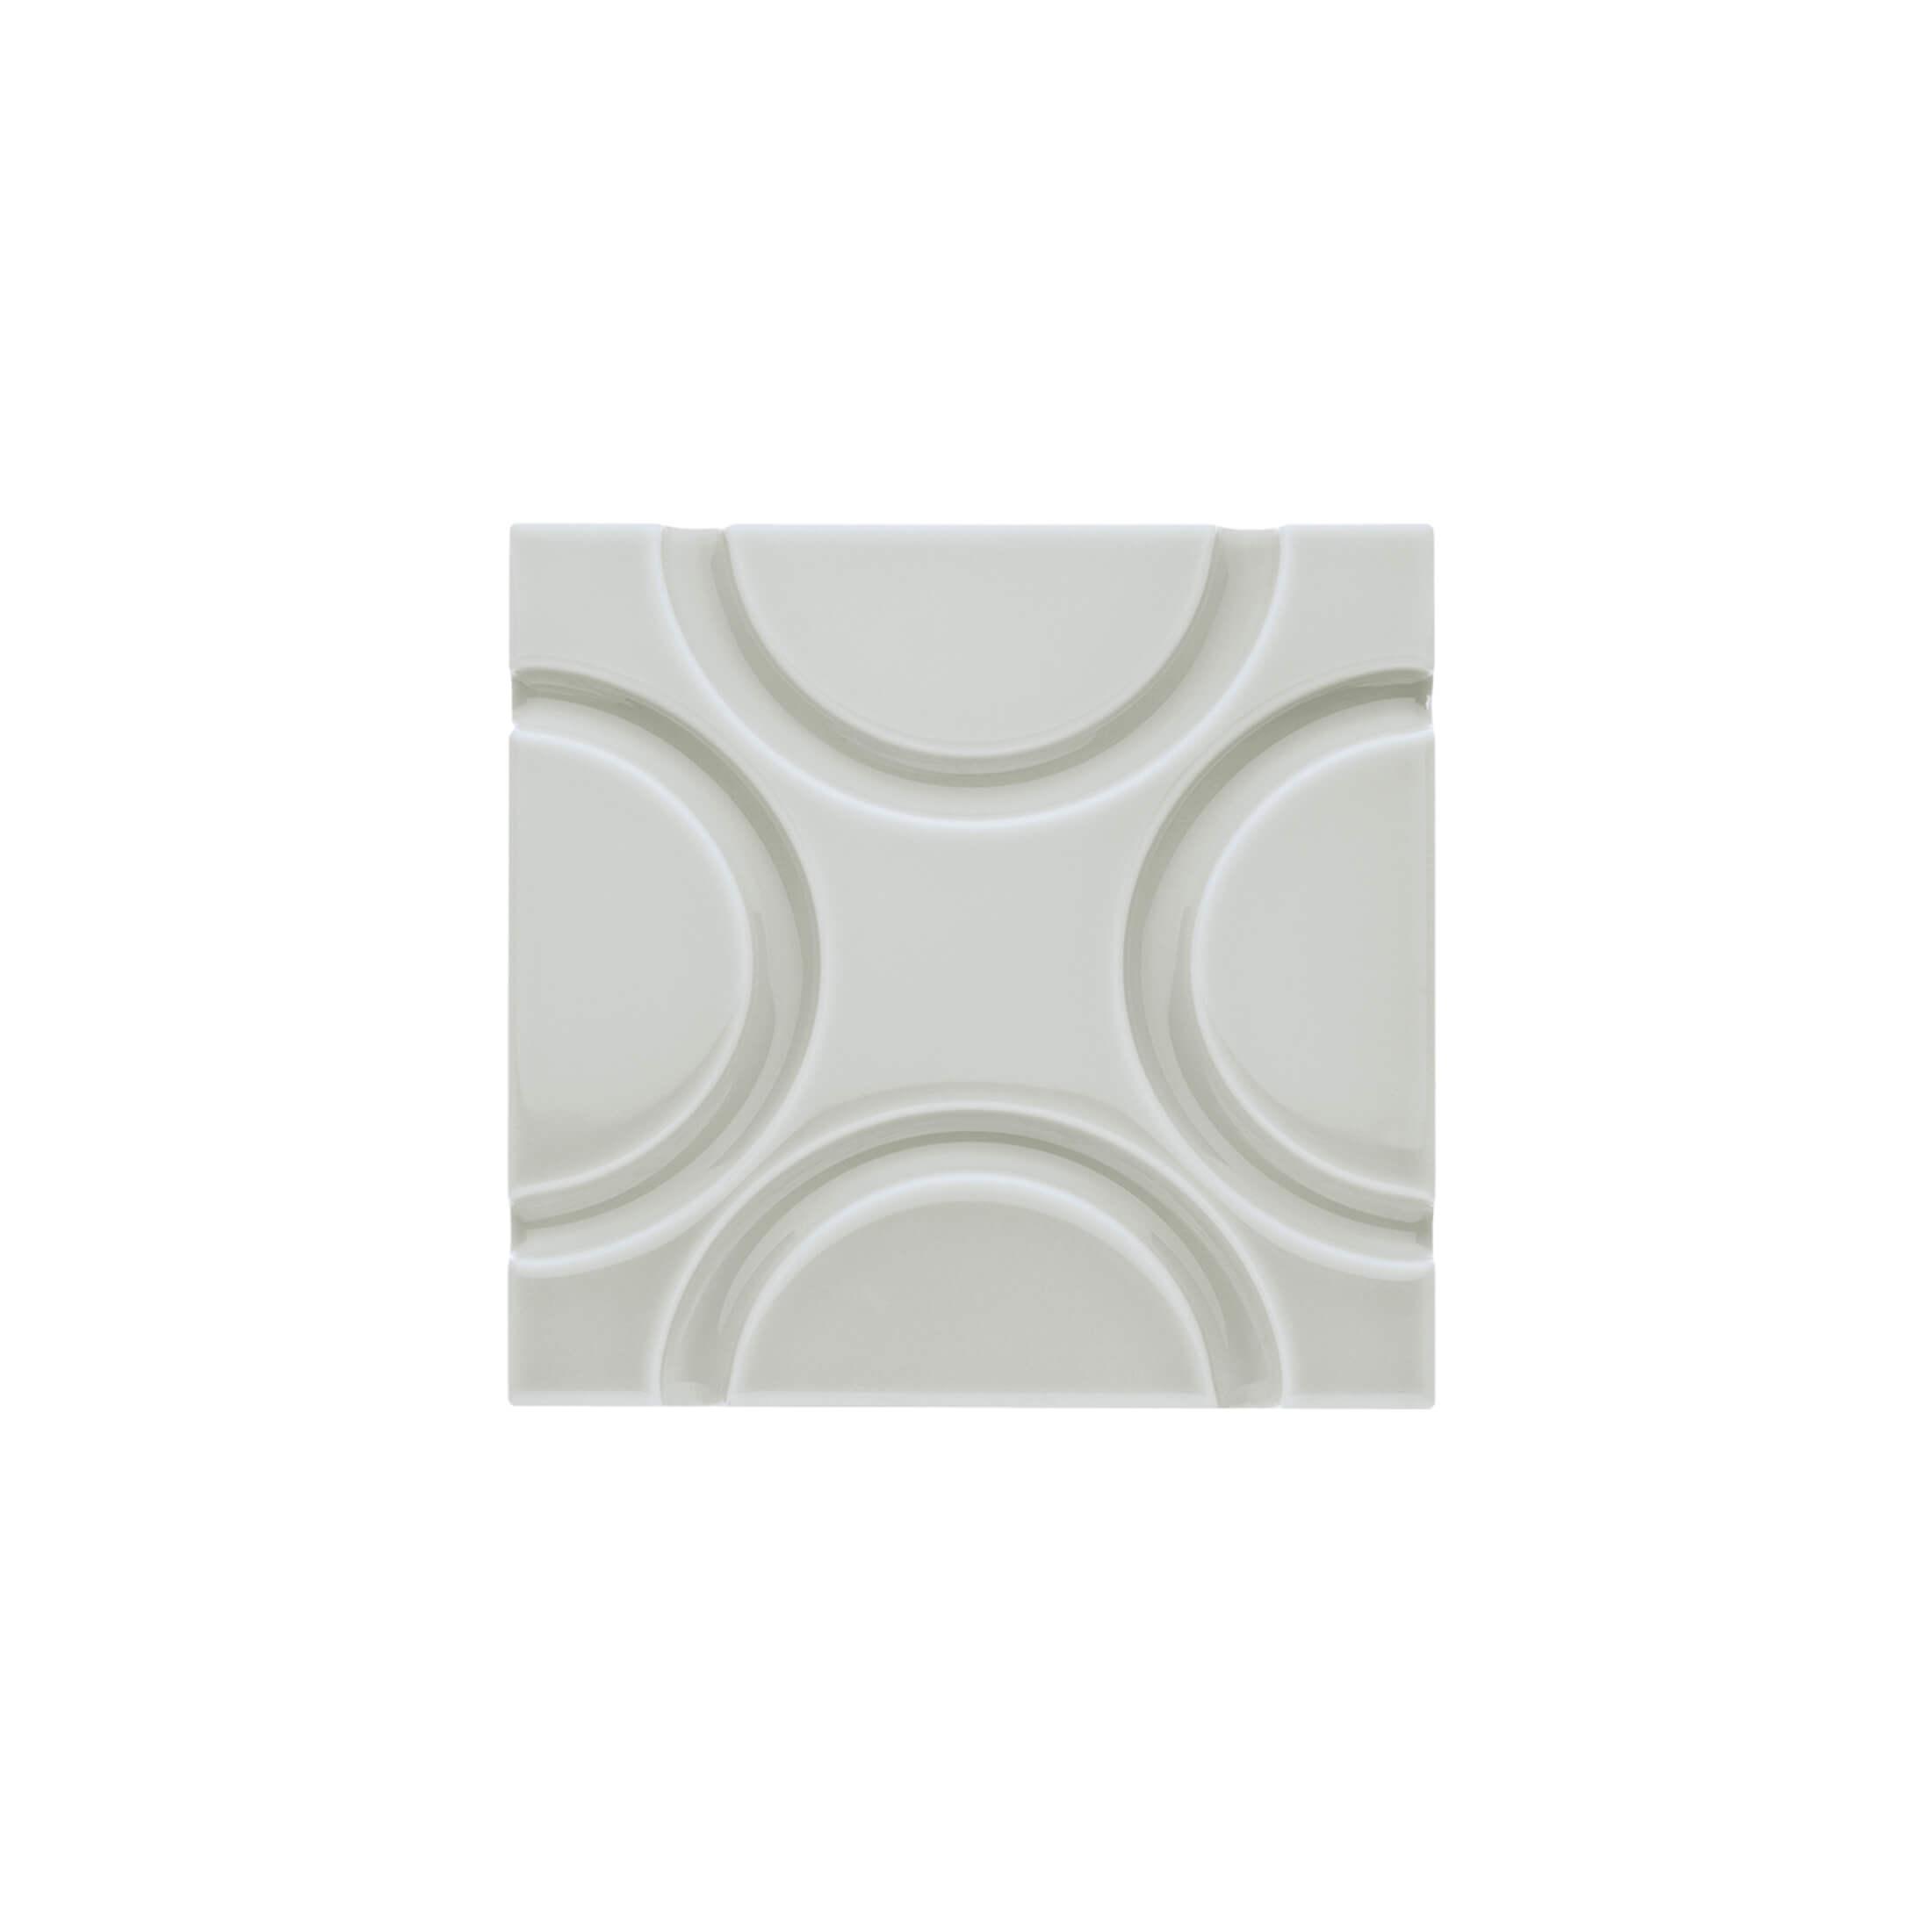 ADNE4138 - LISO GEO - 15 cm X 15 cm